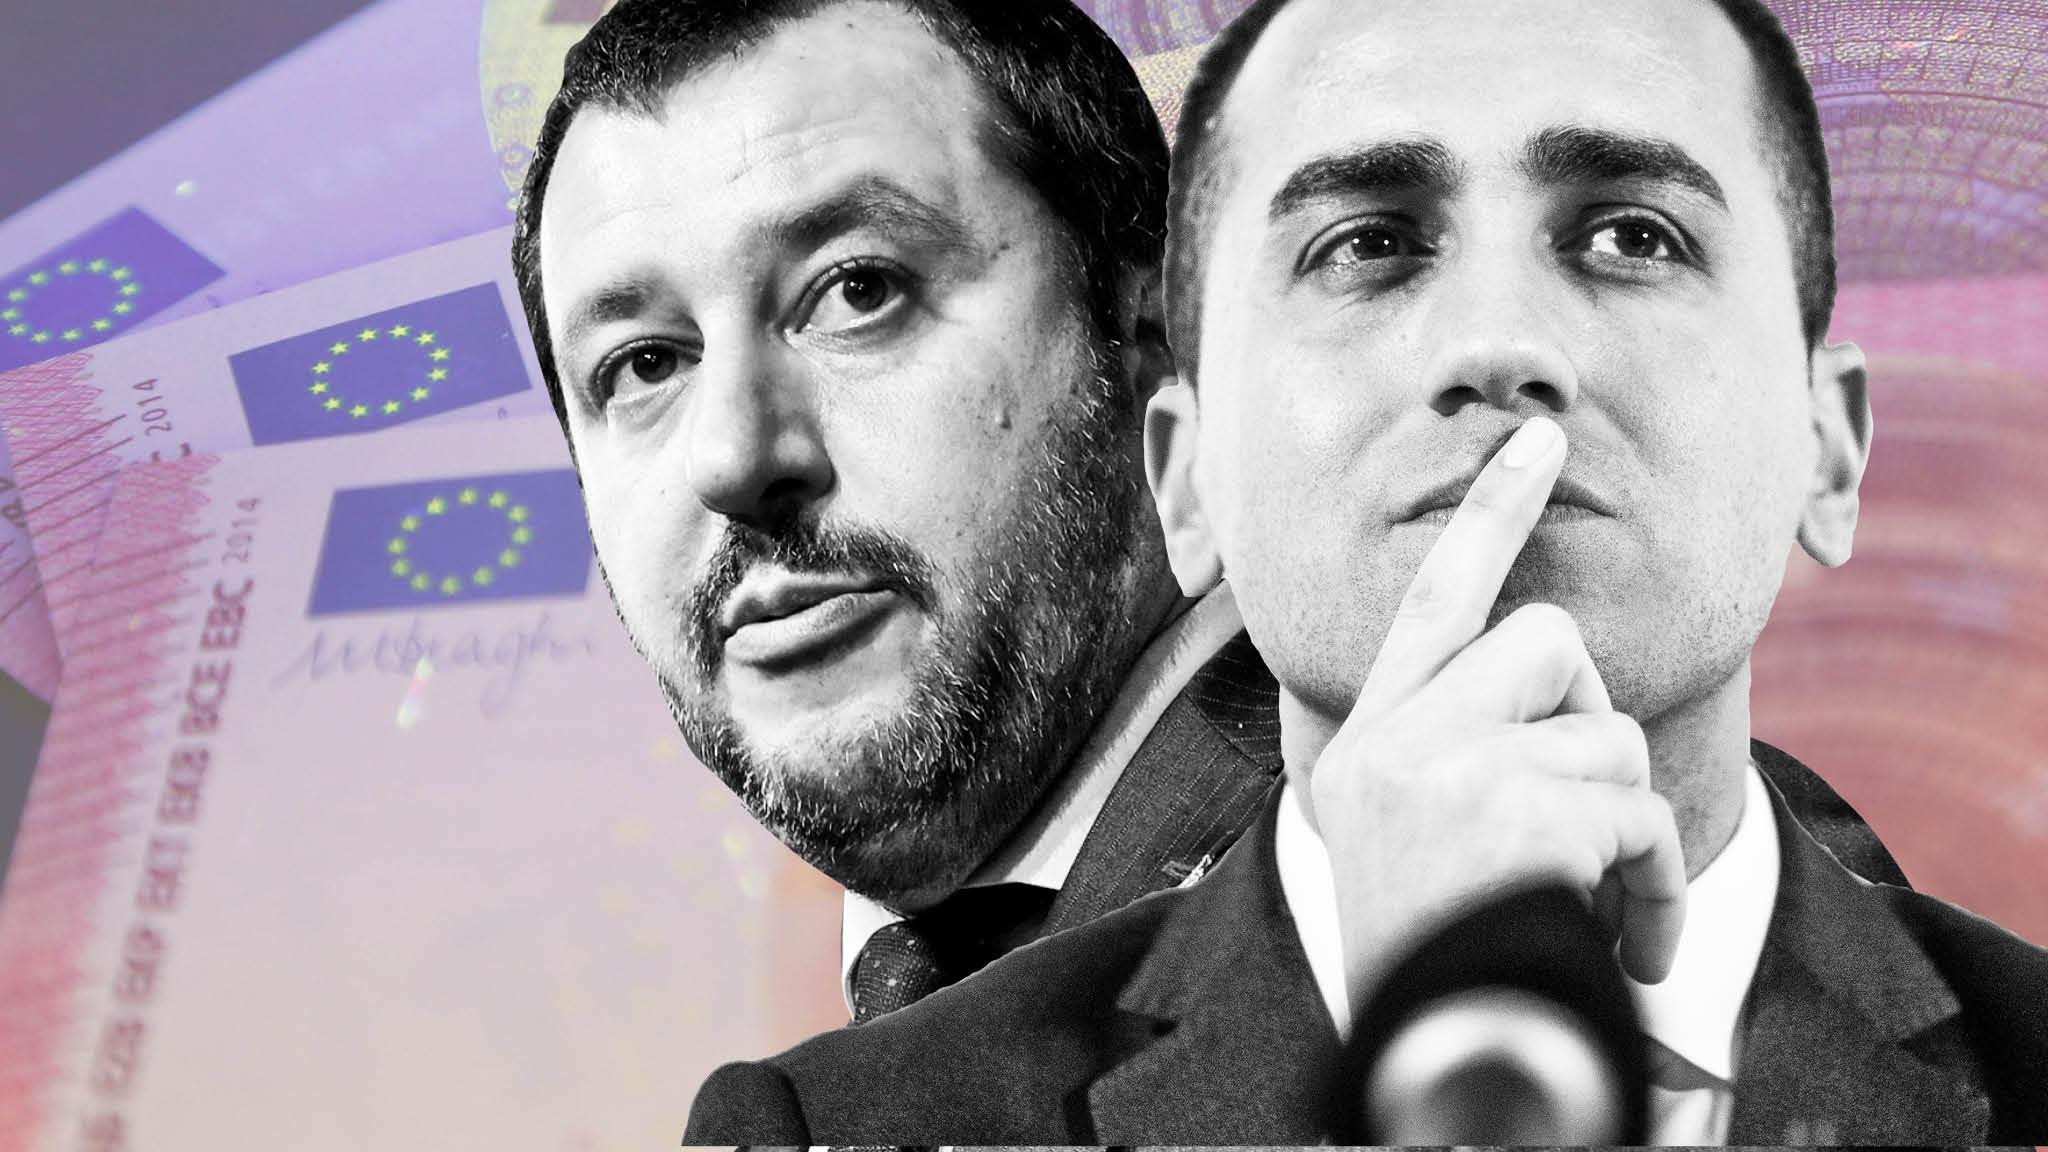 The bond 'spread' strikes fear and shrugs on Italian streets